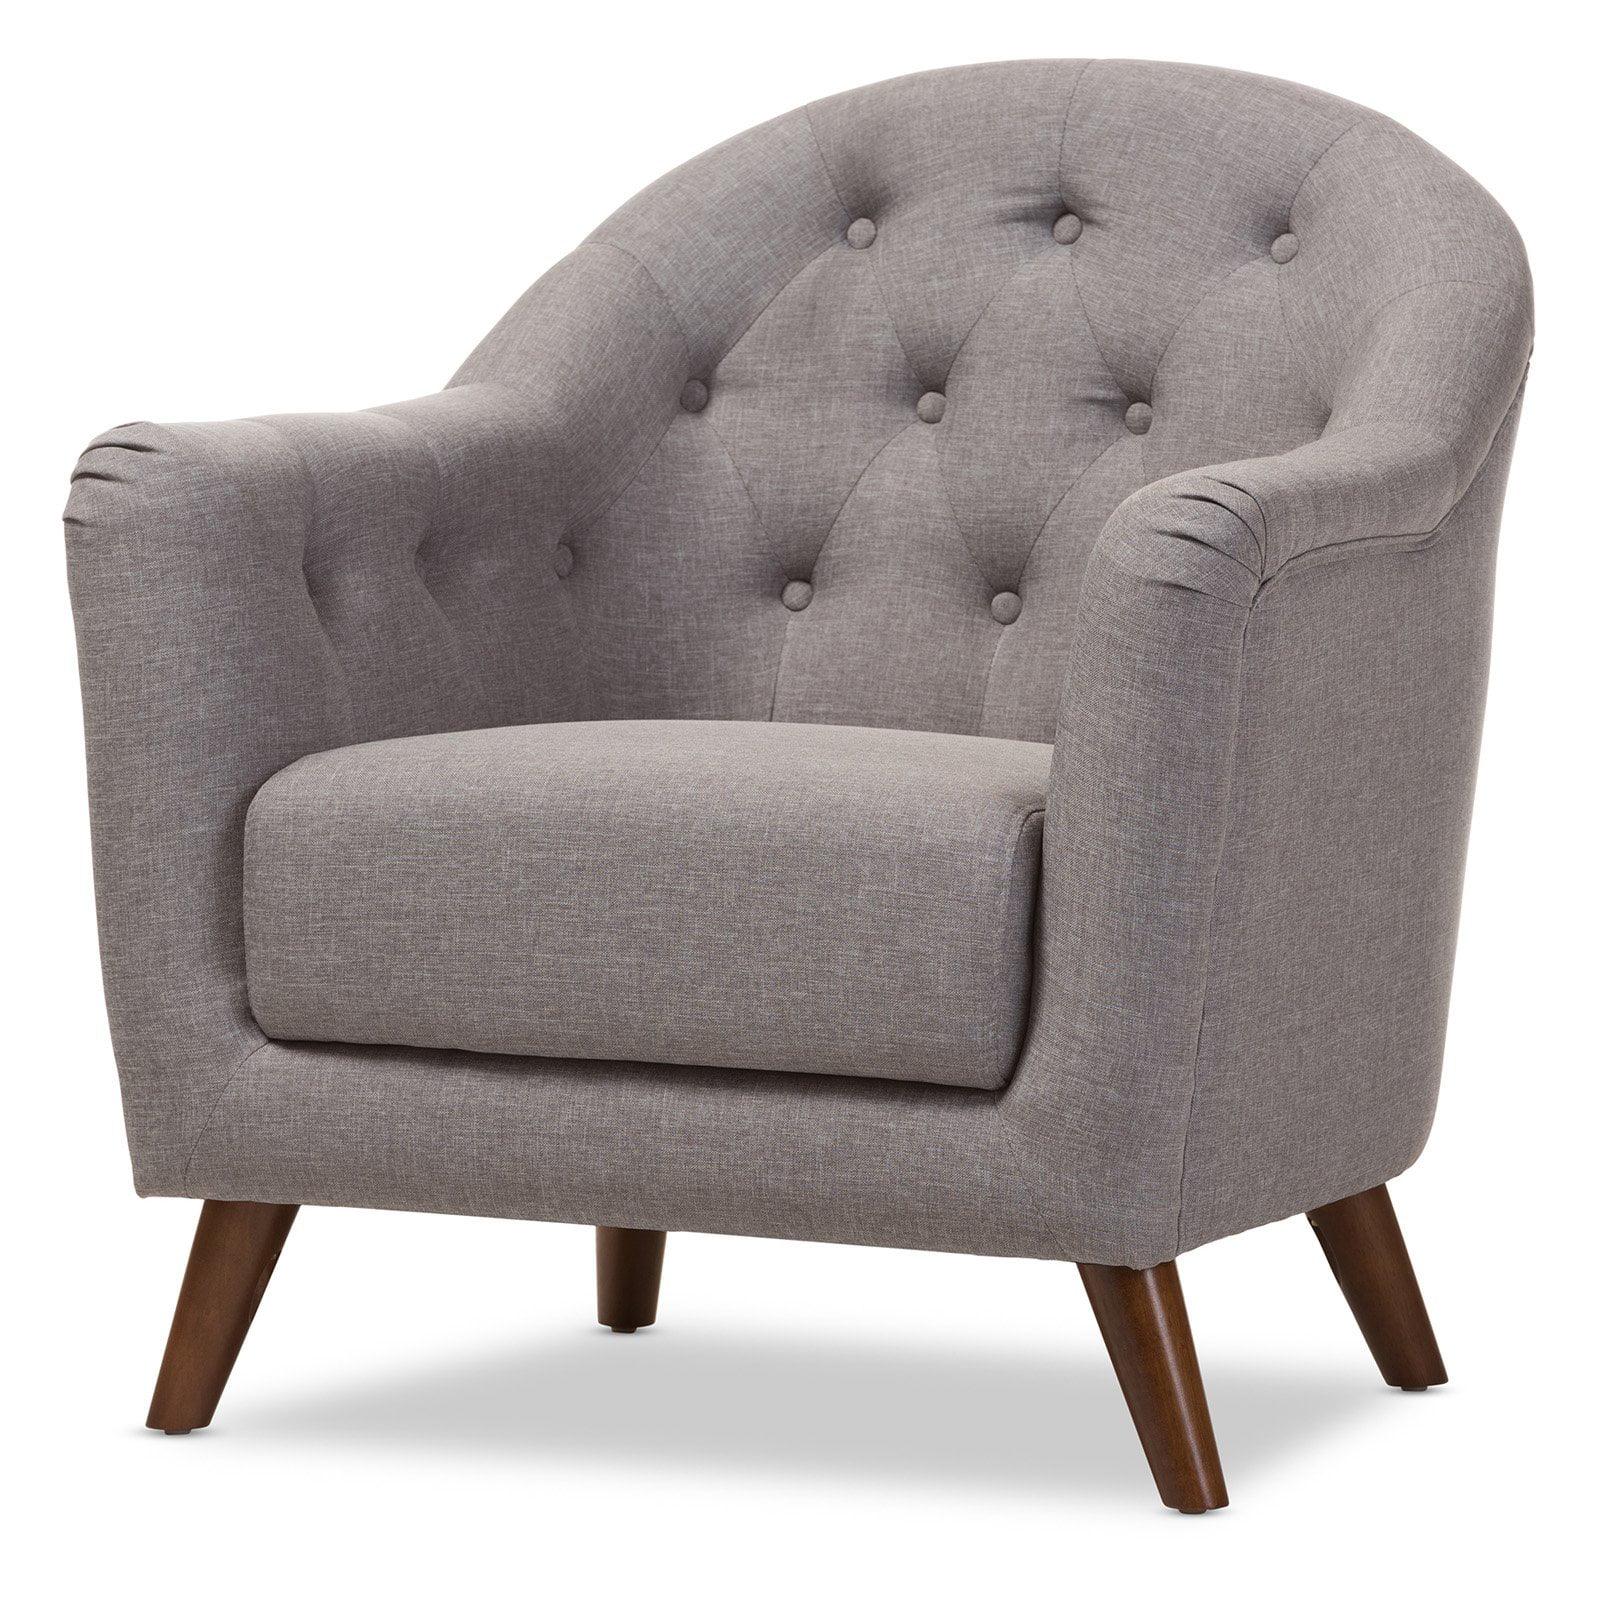 Baxton Studio Lotus Mid-Century Modern Light Gray Fabric Upholstered Walnut Wood Button-Tufted Armchair by Baxton Studio